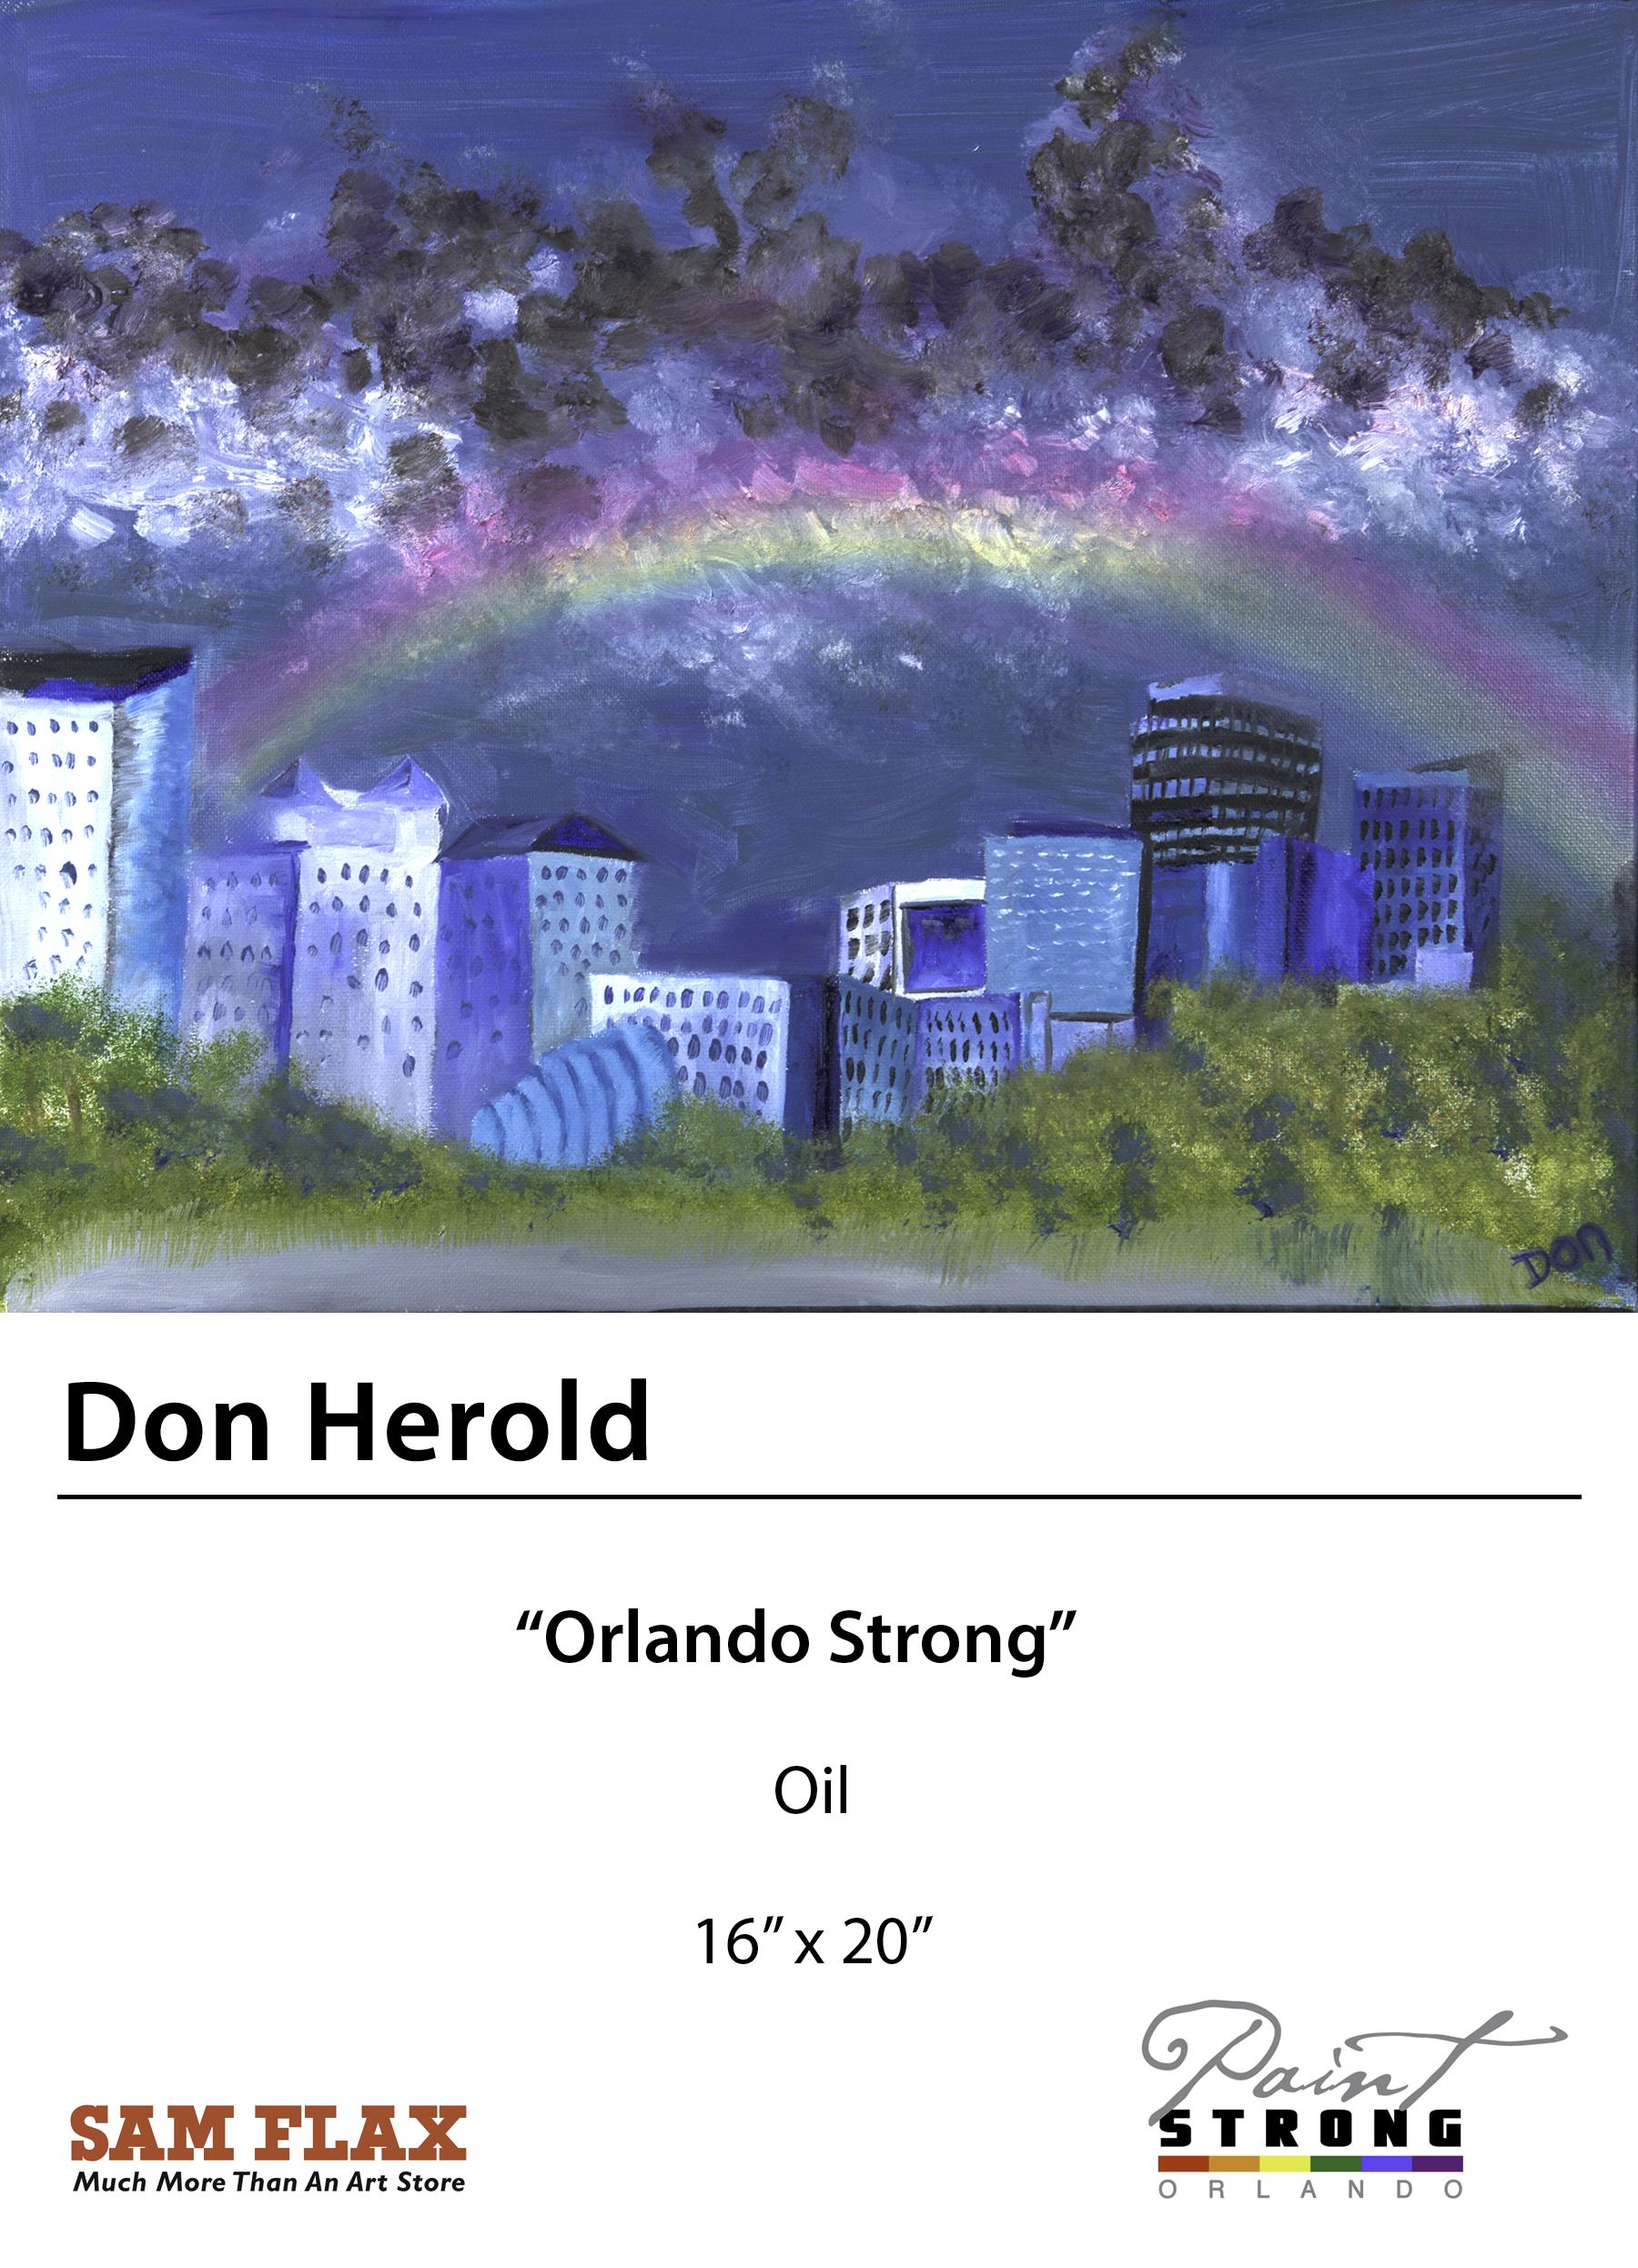 Don Herold